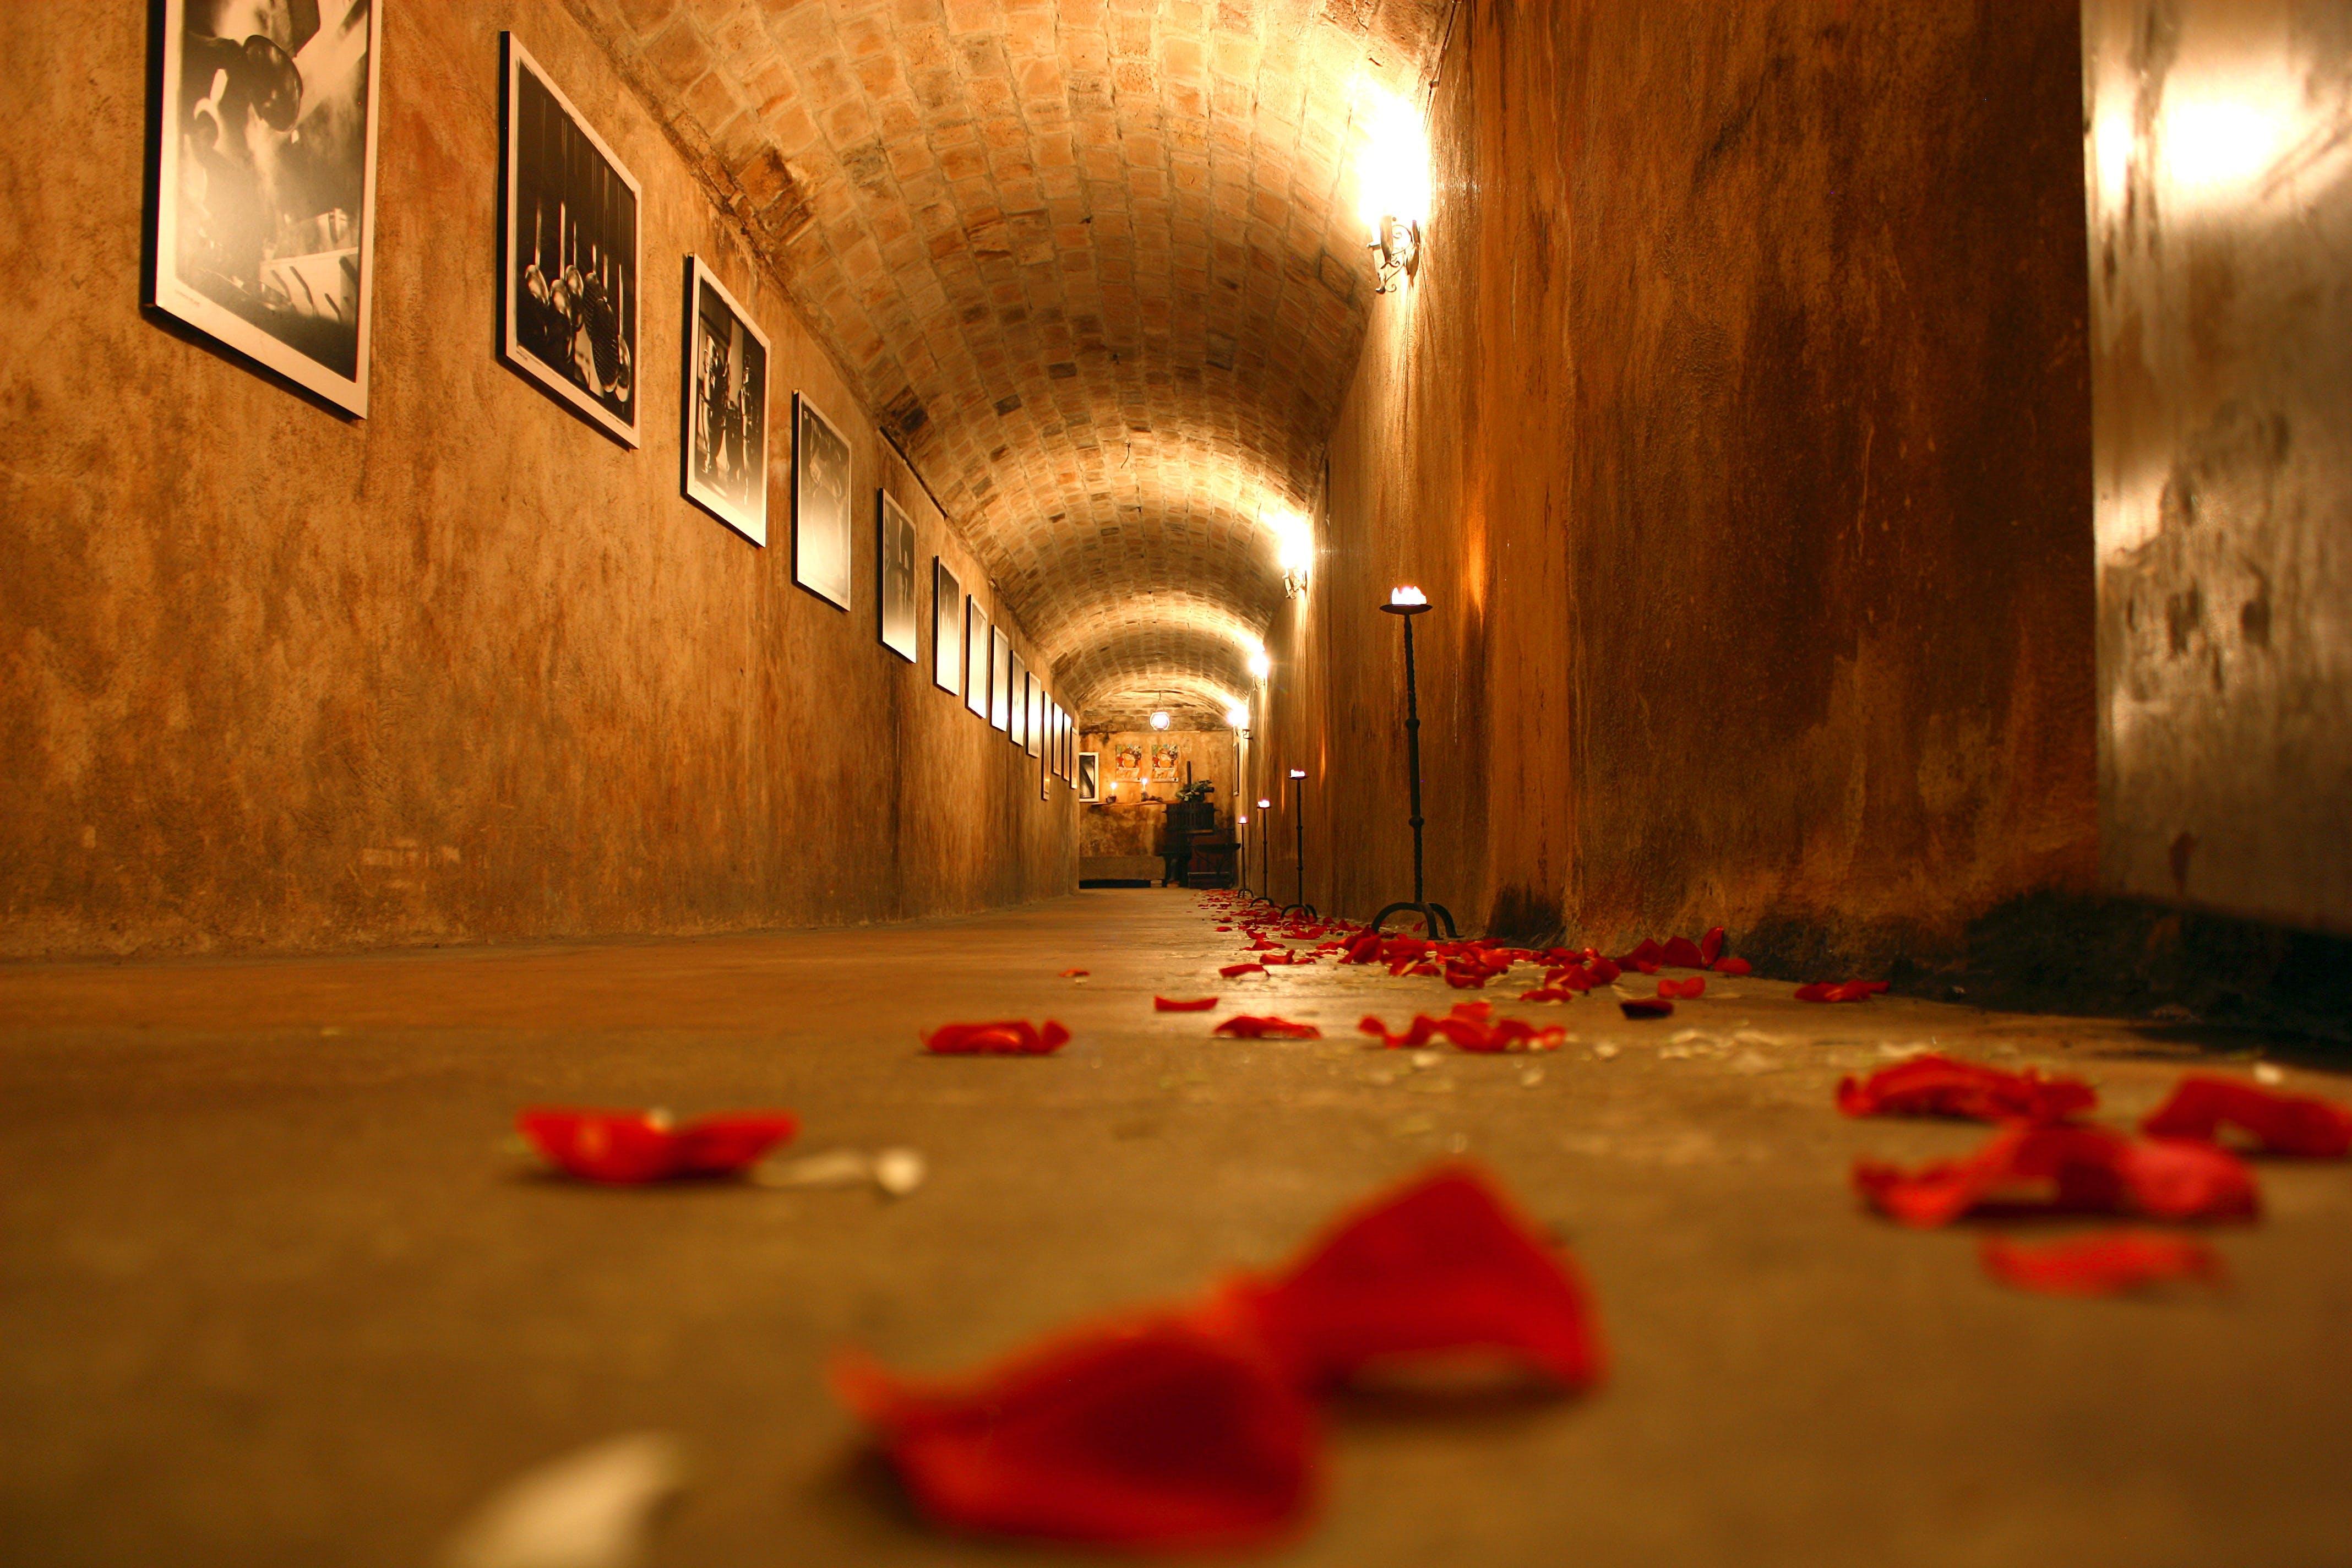 Red Flower Petals on Hallway